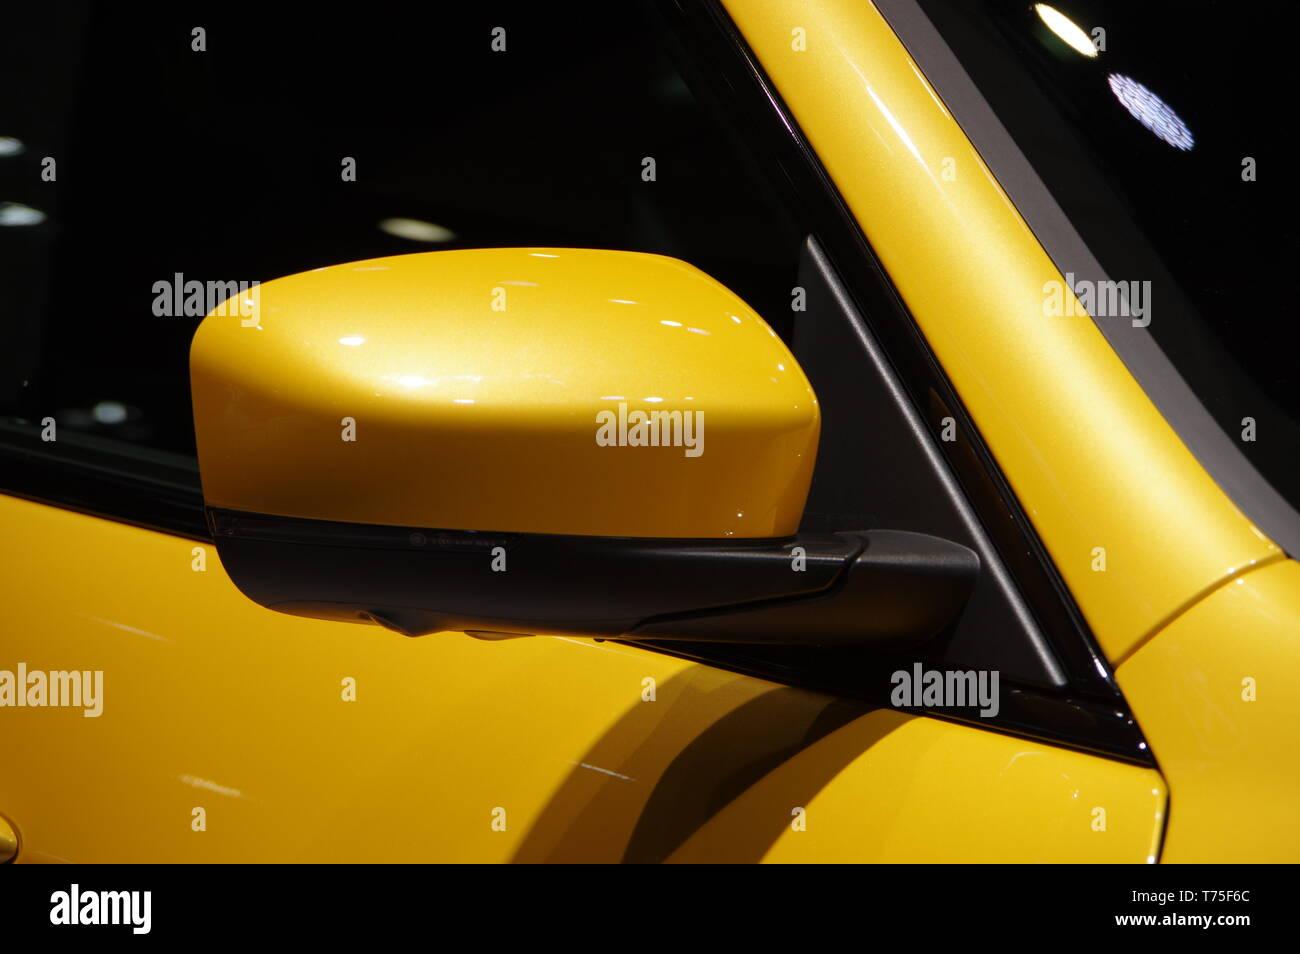 Modern yellow car body details - Stock Image